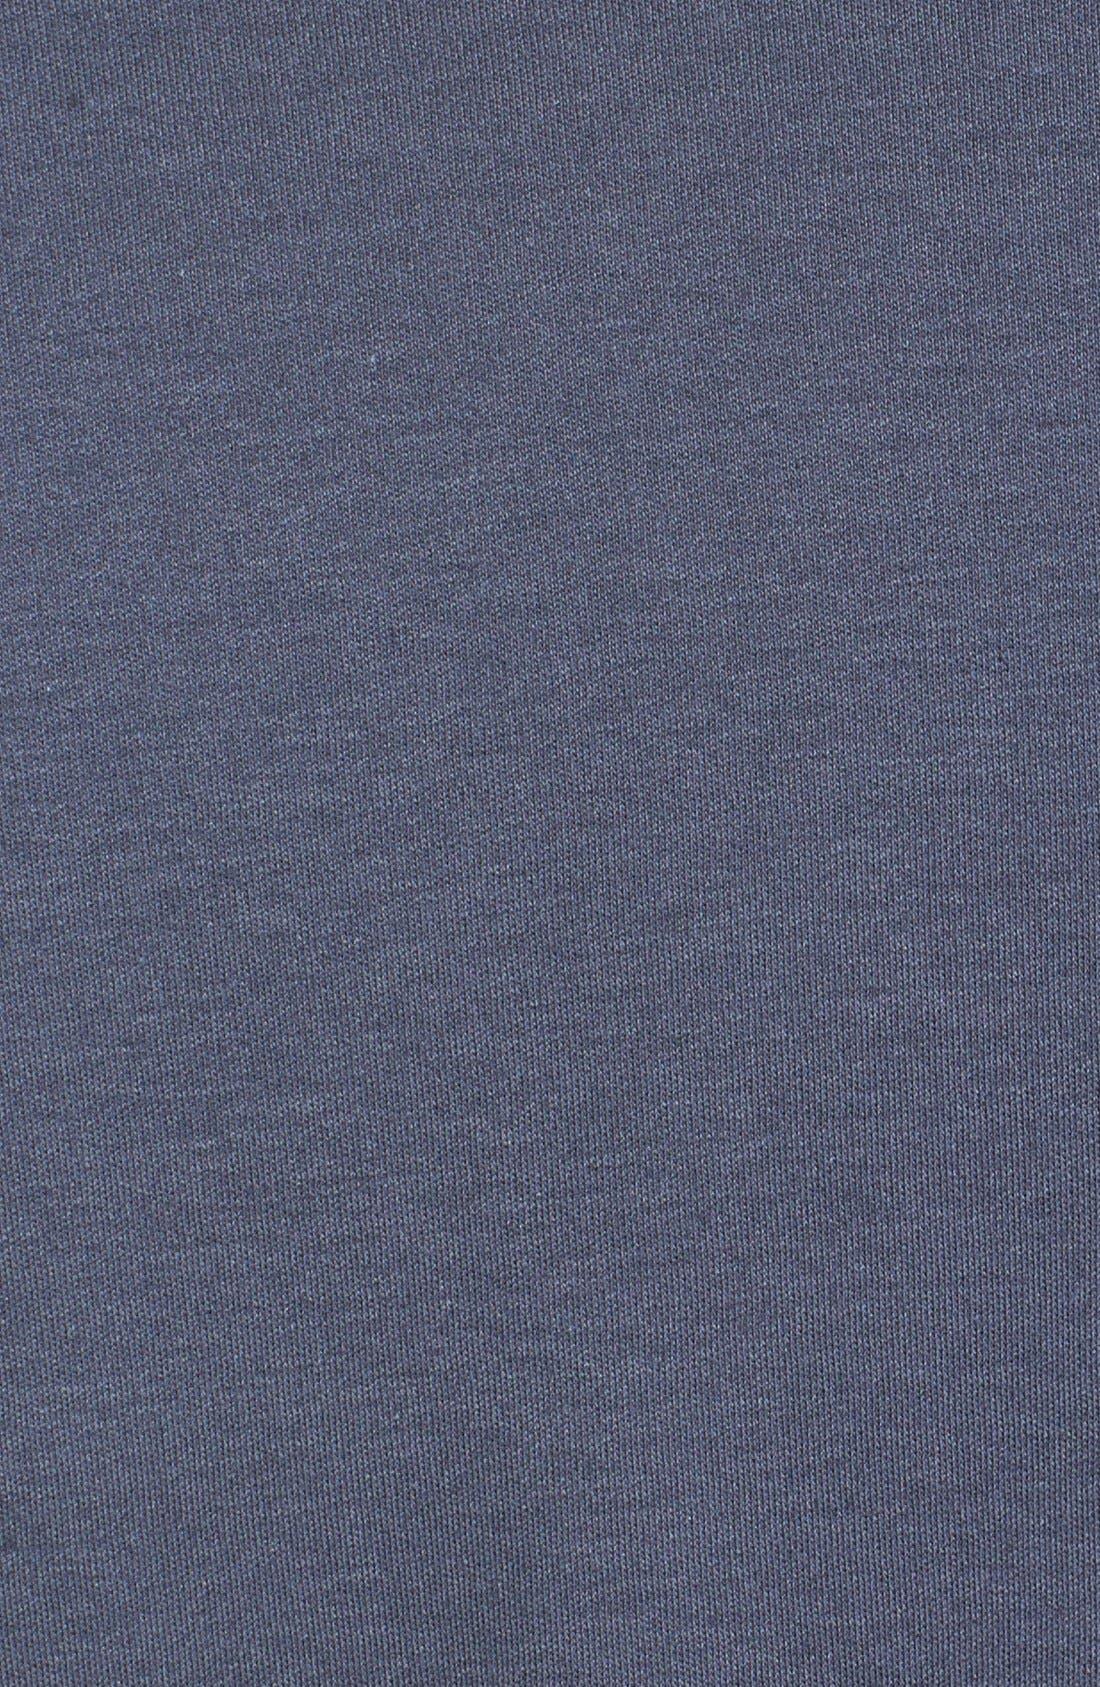 'Belfair' Quarter Zip Pima Cotton Pullover,                             Alternate thumbnail 3, color,                             051